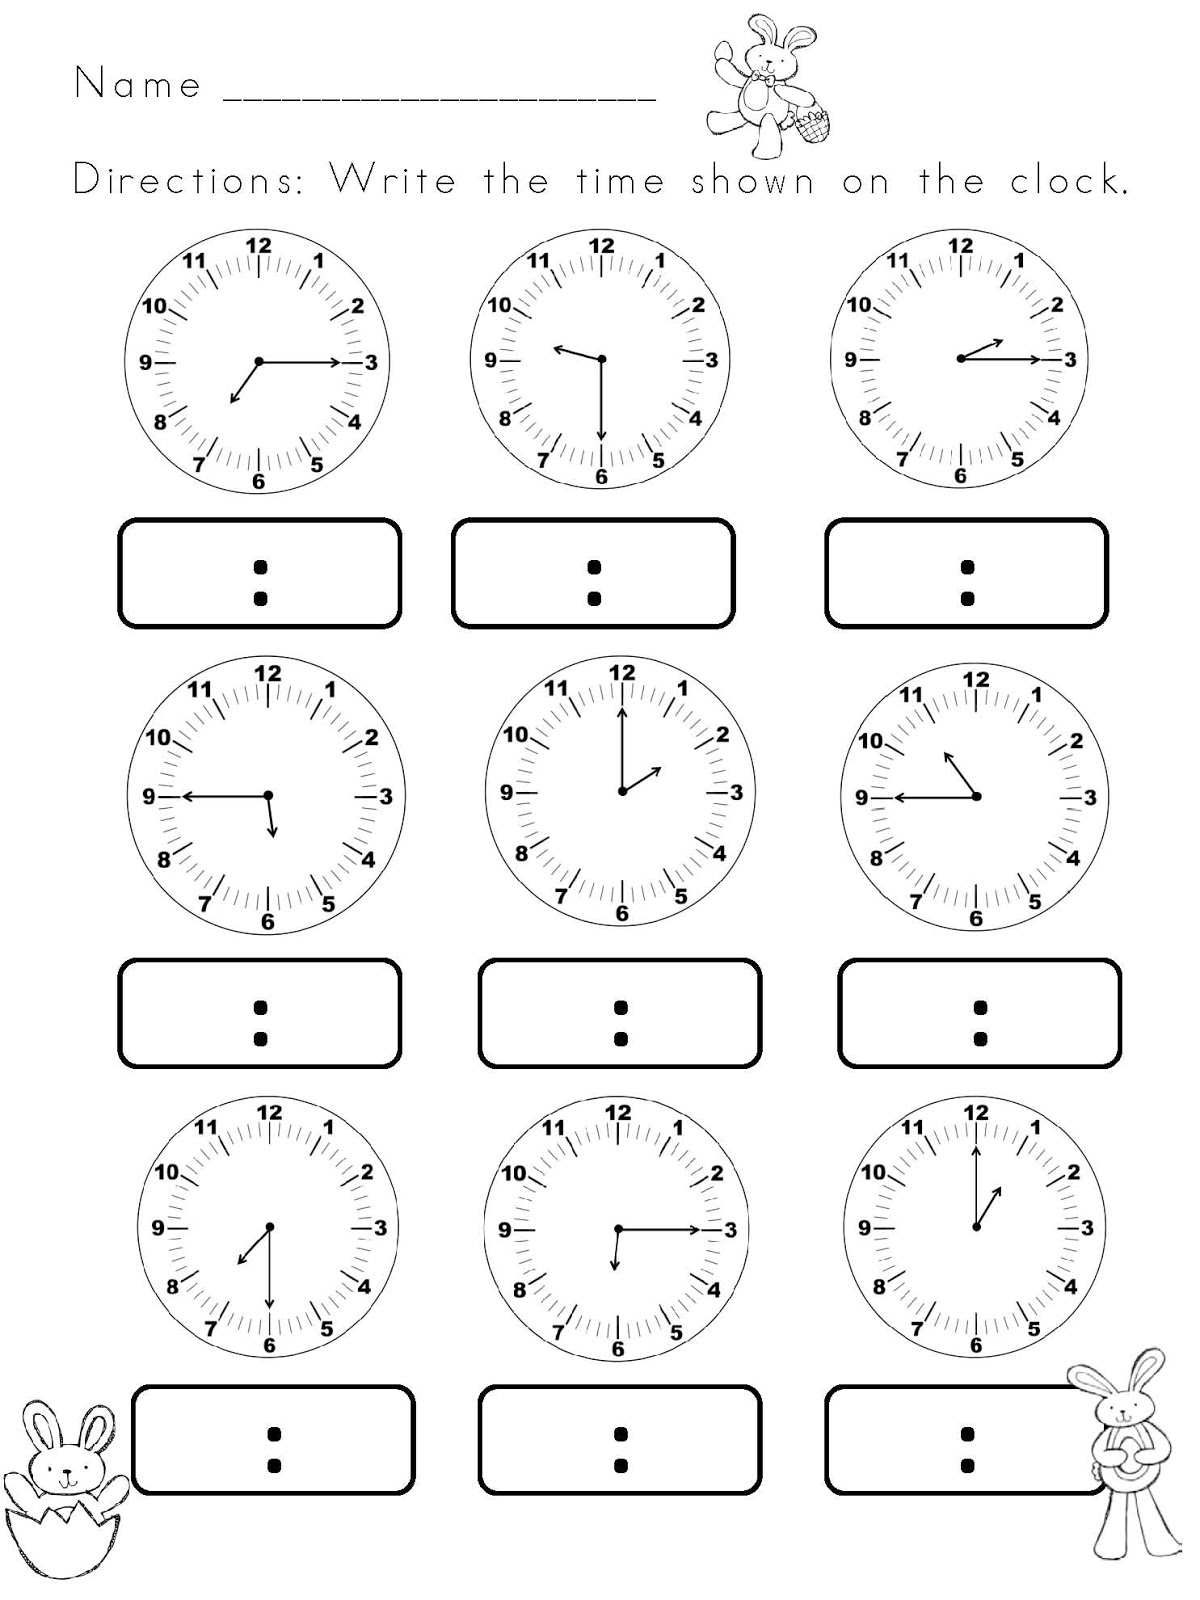 converting between analogue and digital time worksheets pdf